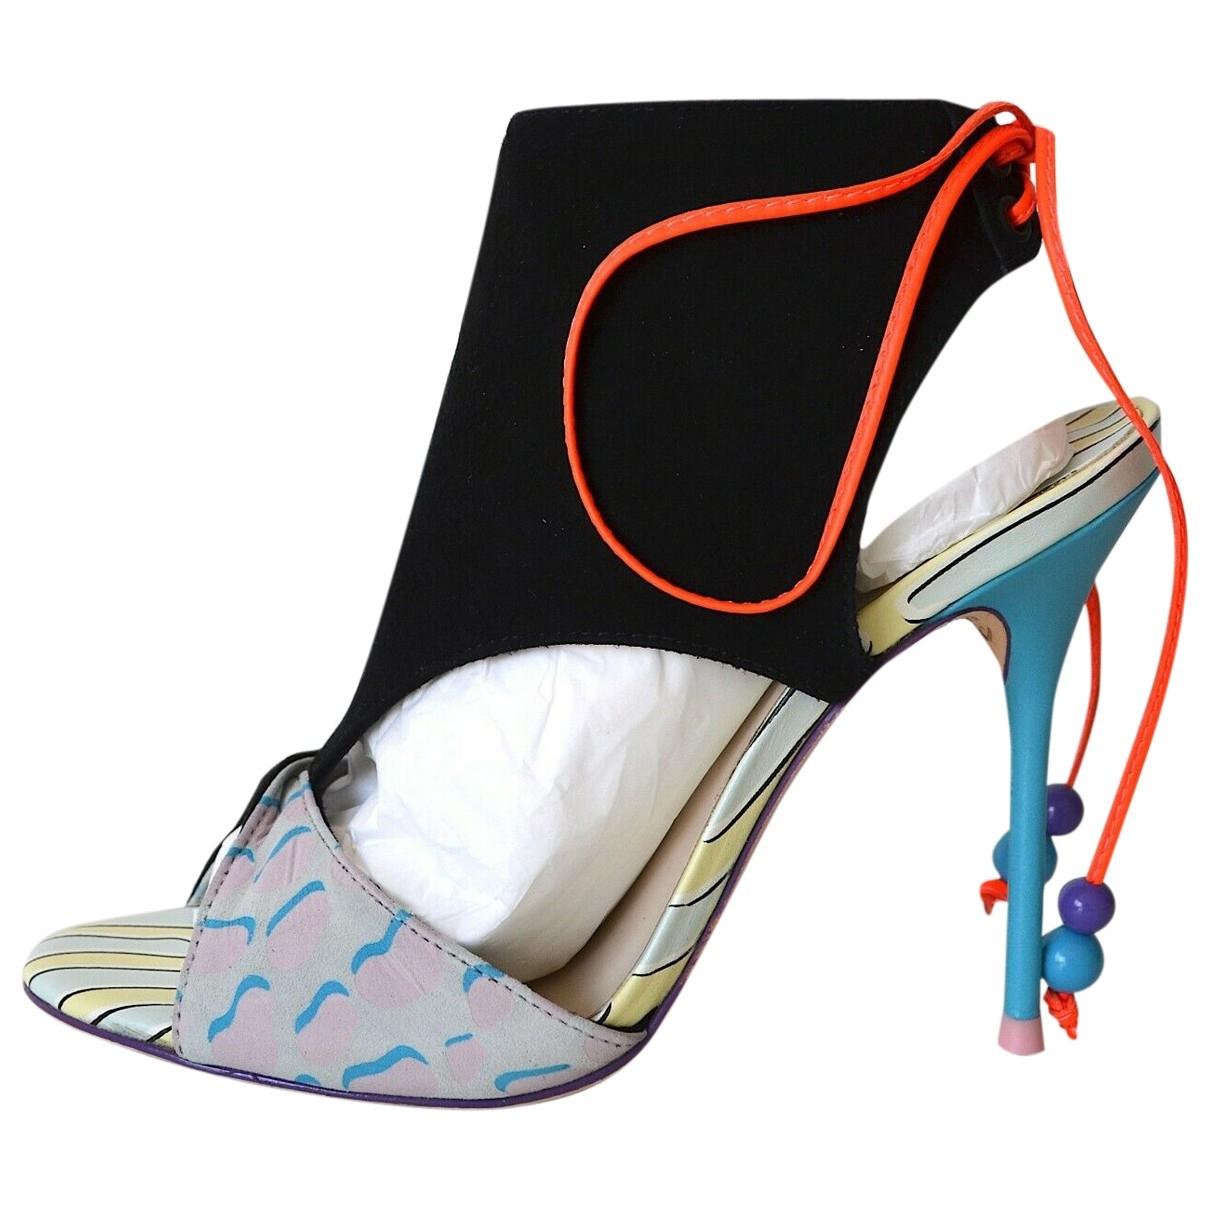 Sandalias de Cuero Sophia Webster